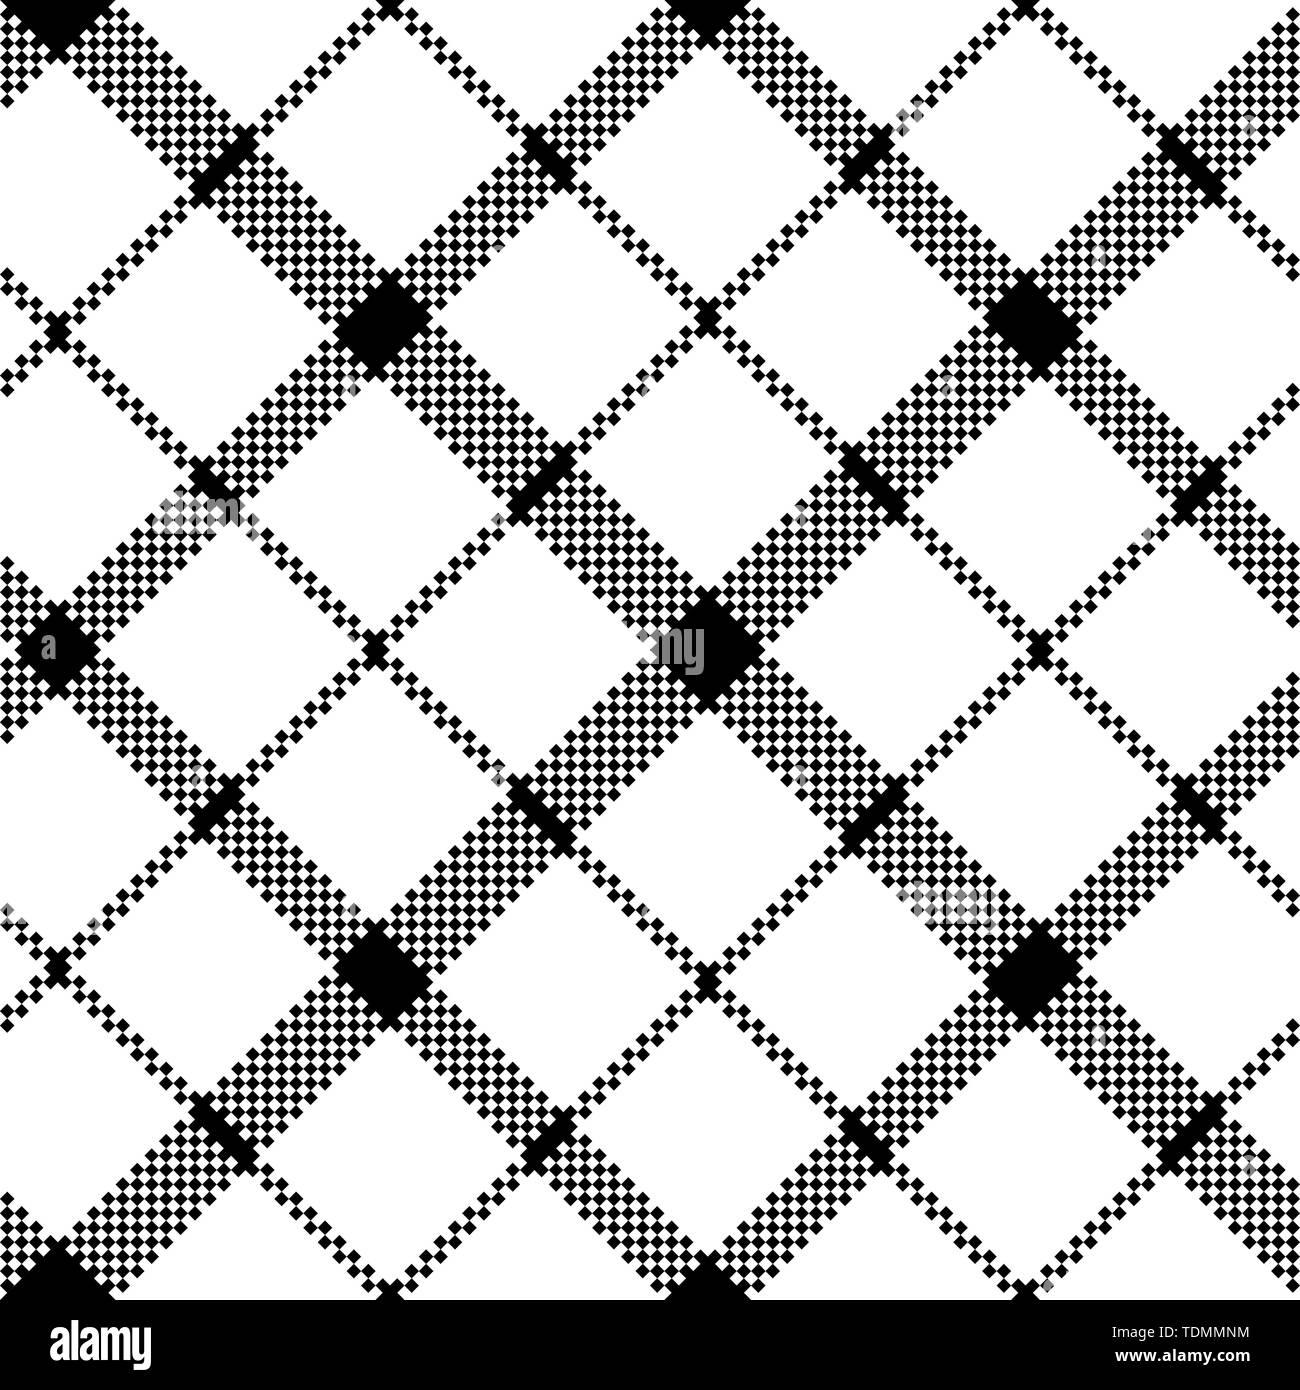 Flower of scotland tartan black white pixel seamless pattern. Vector illustration. - Stock Vector